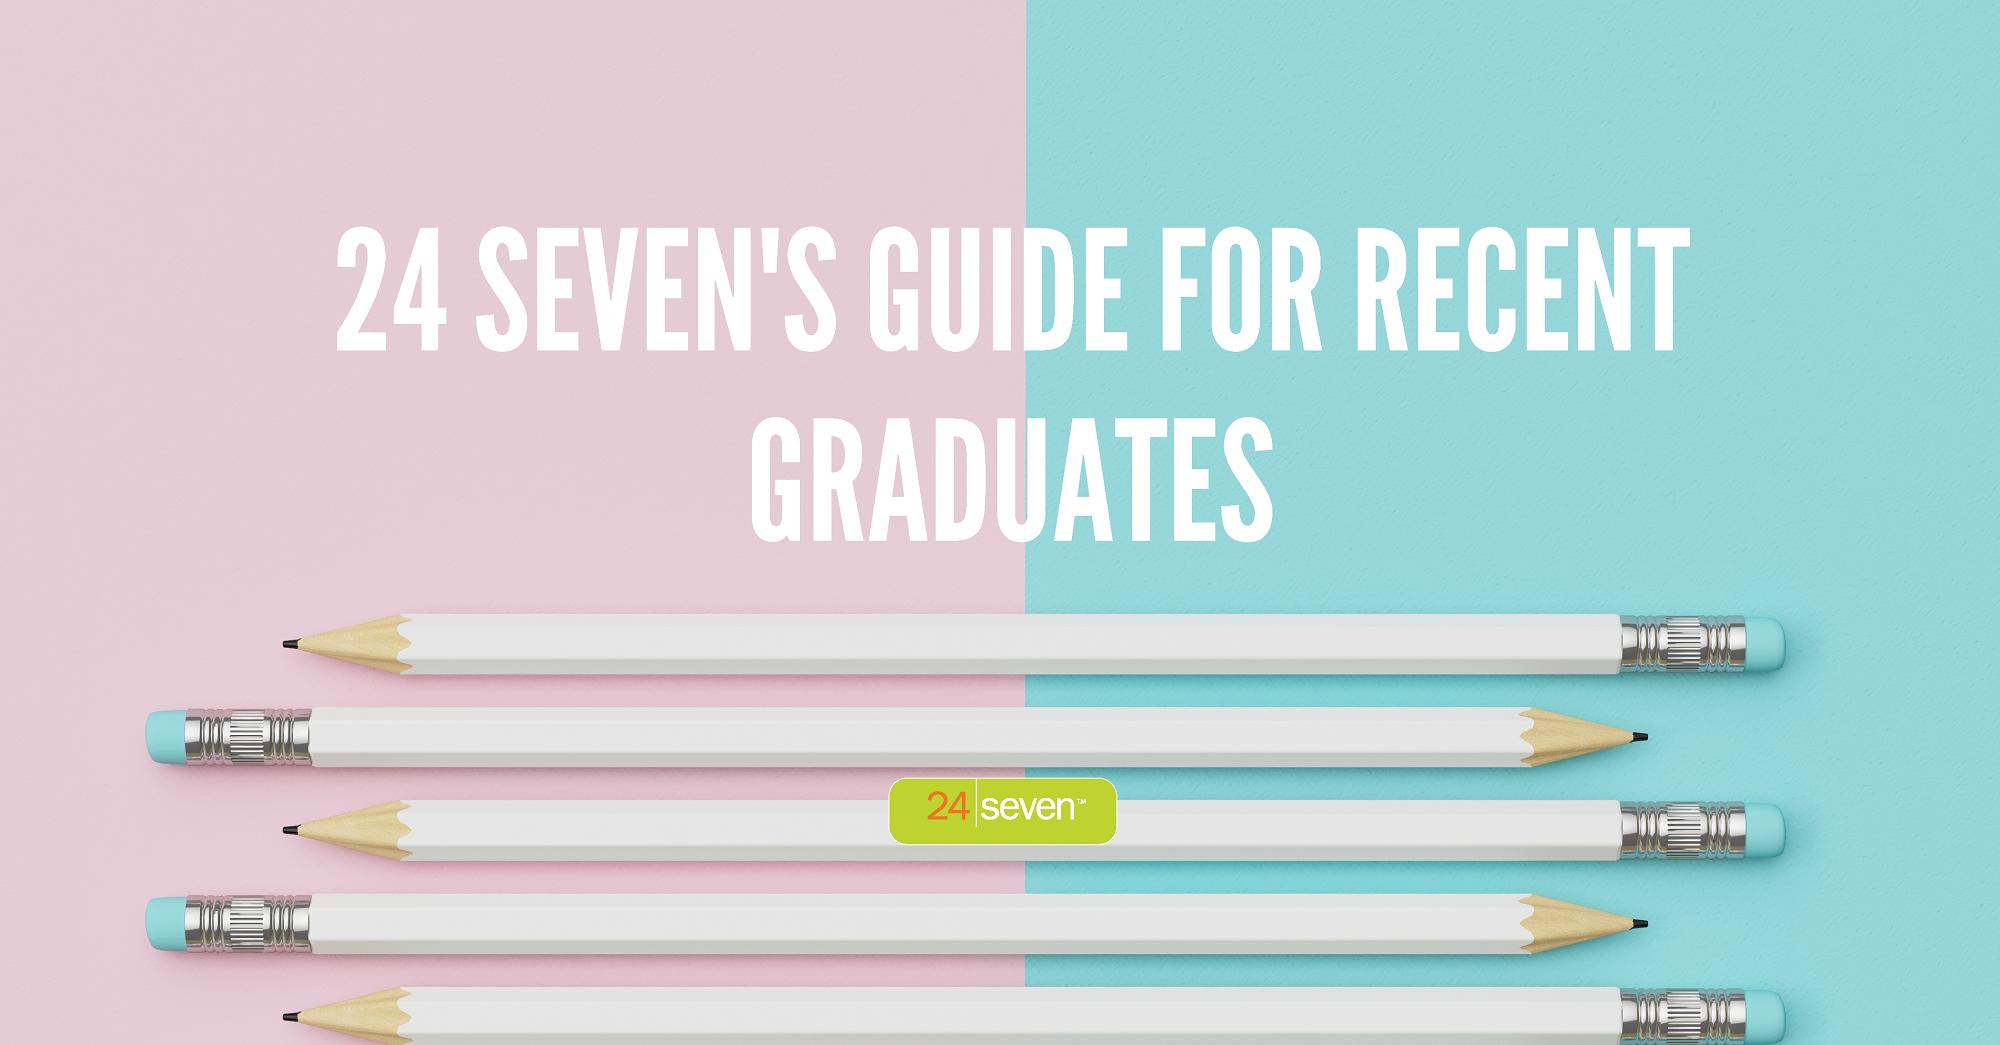 24 Sevens Guide For Recent Grads